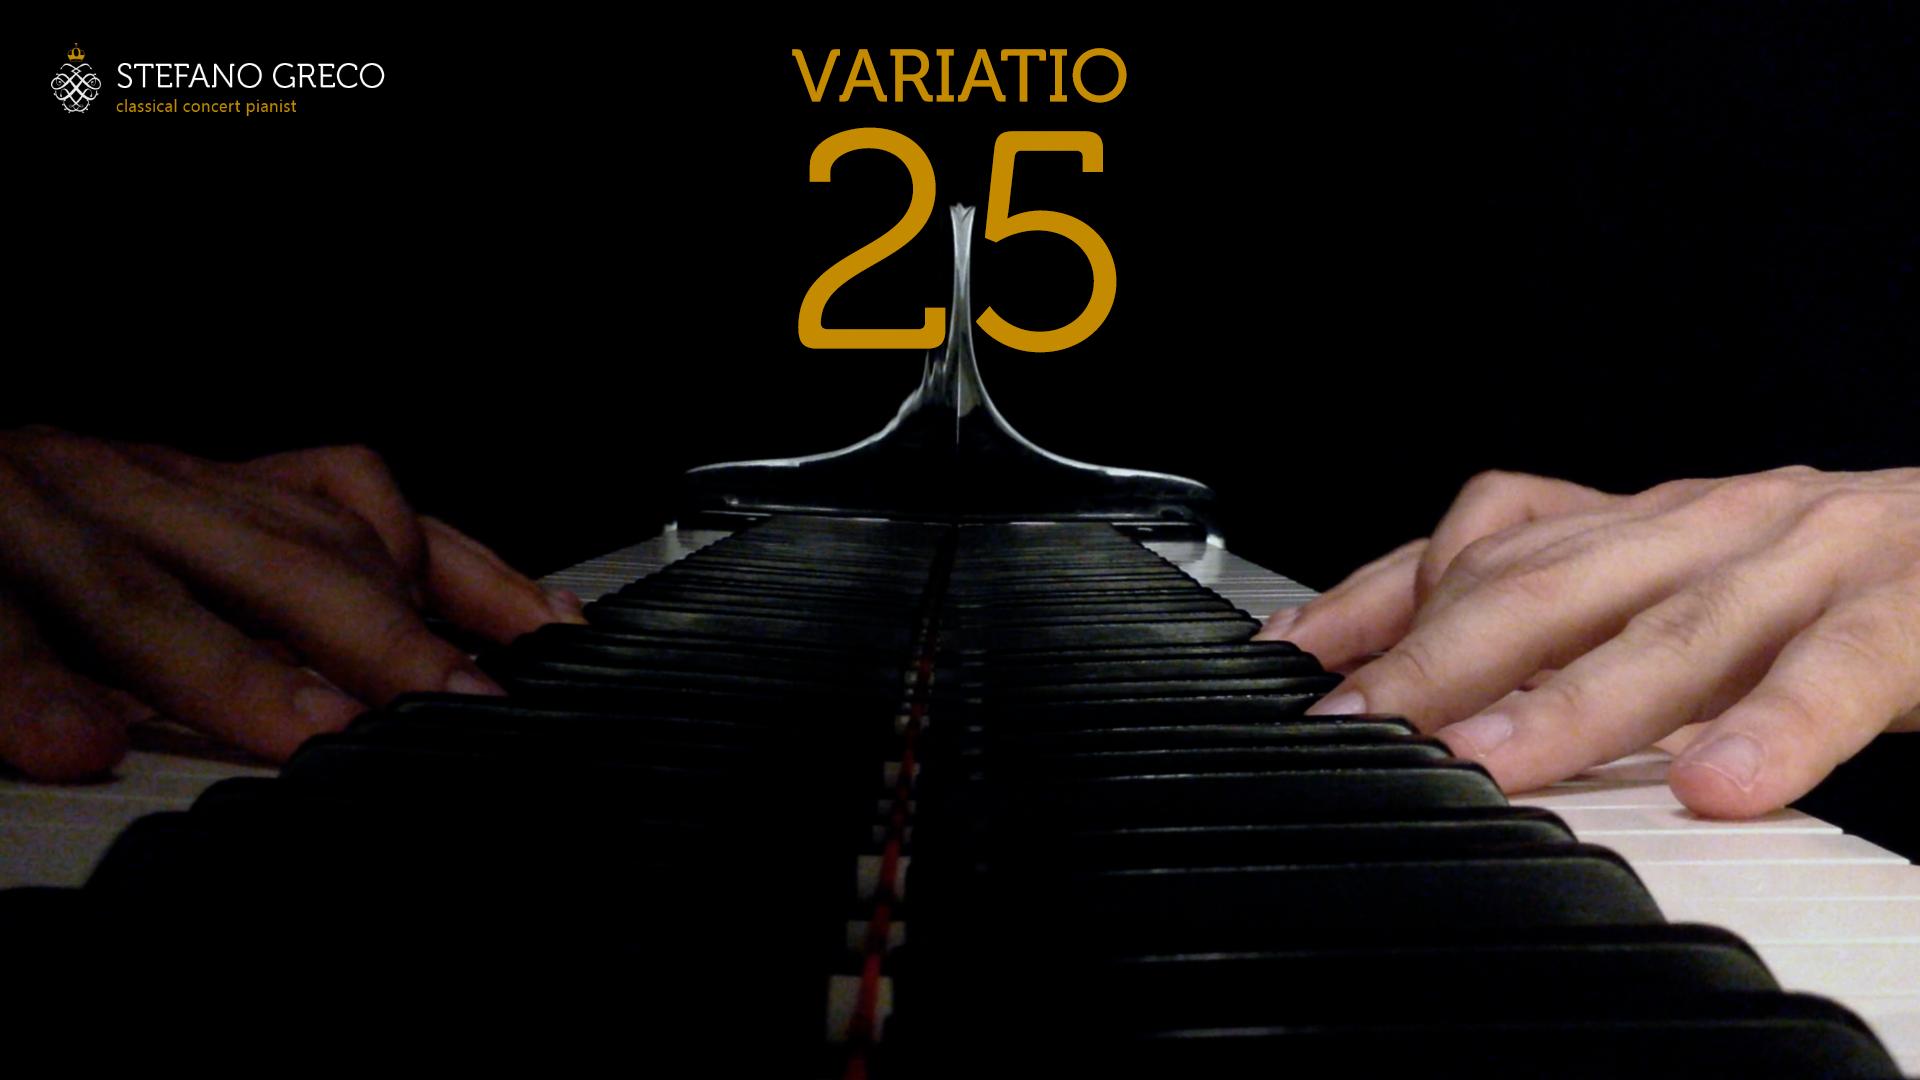 Bach. Goldberg Variations. Variatio XXV. Stefano Greco, piano